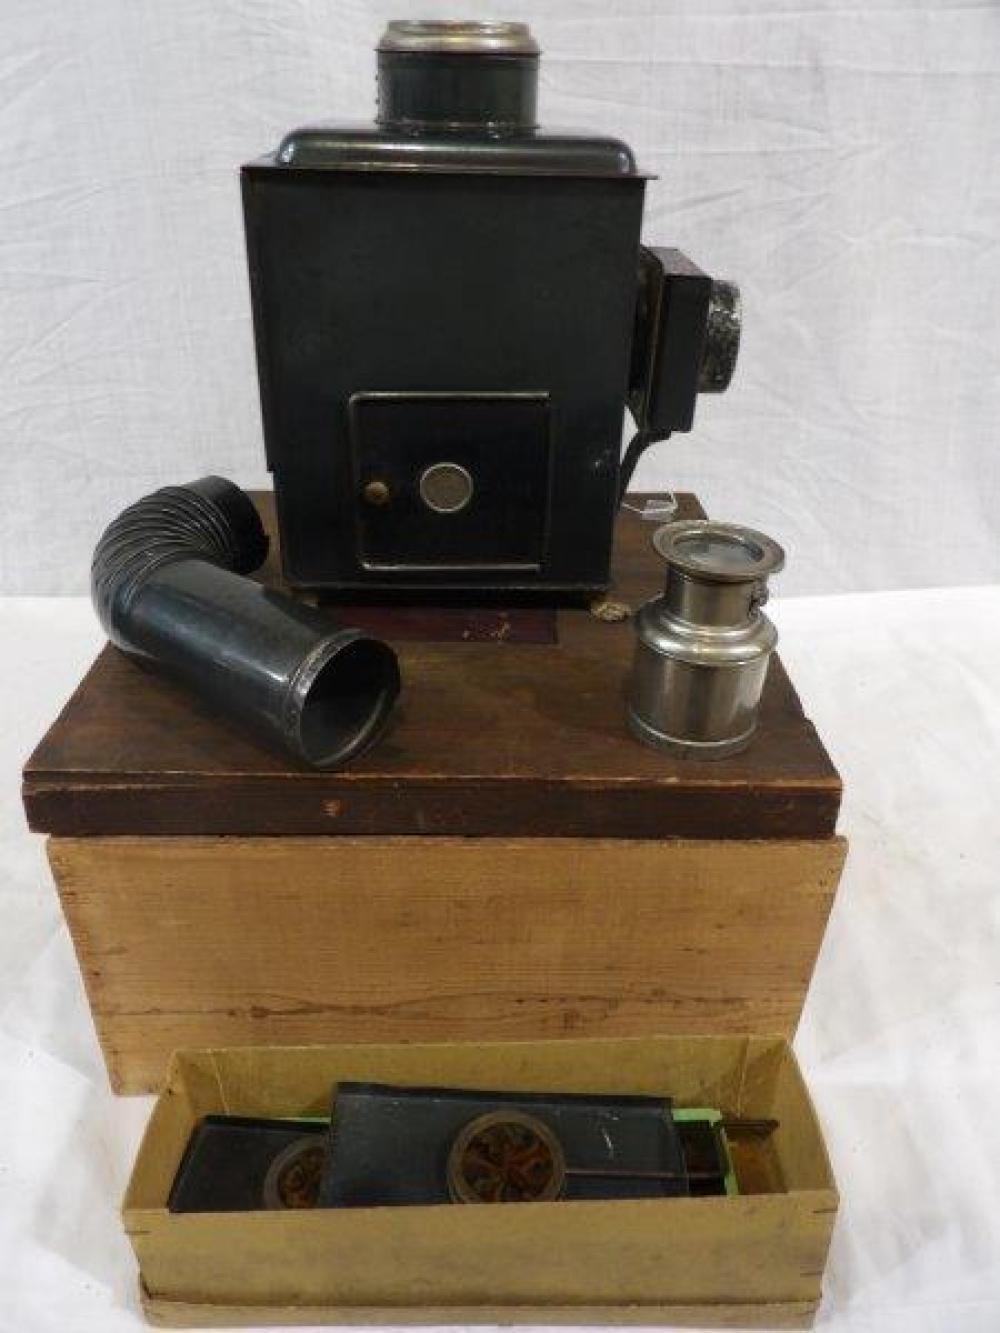 The Exhibition slide projector Lantern